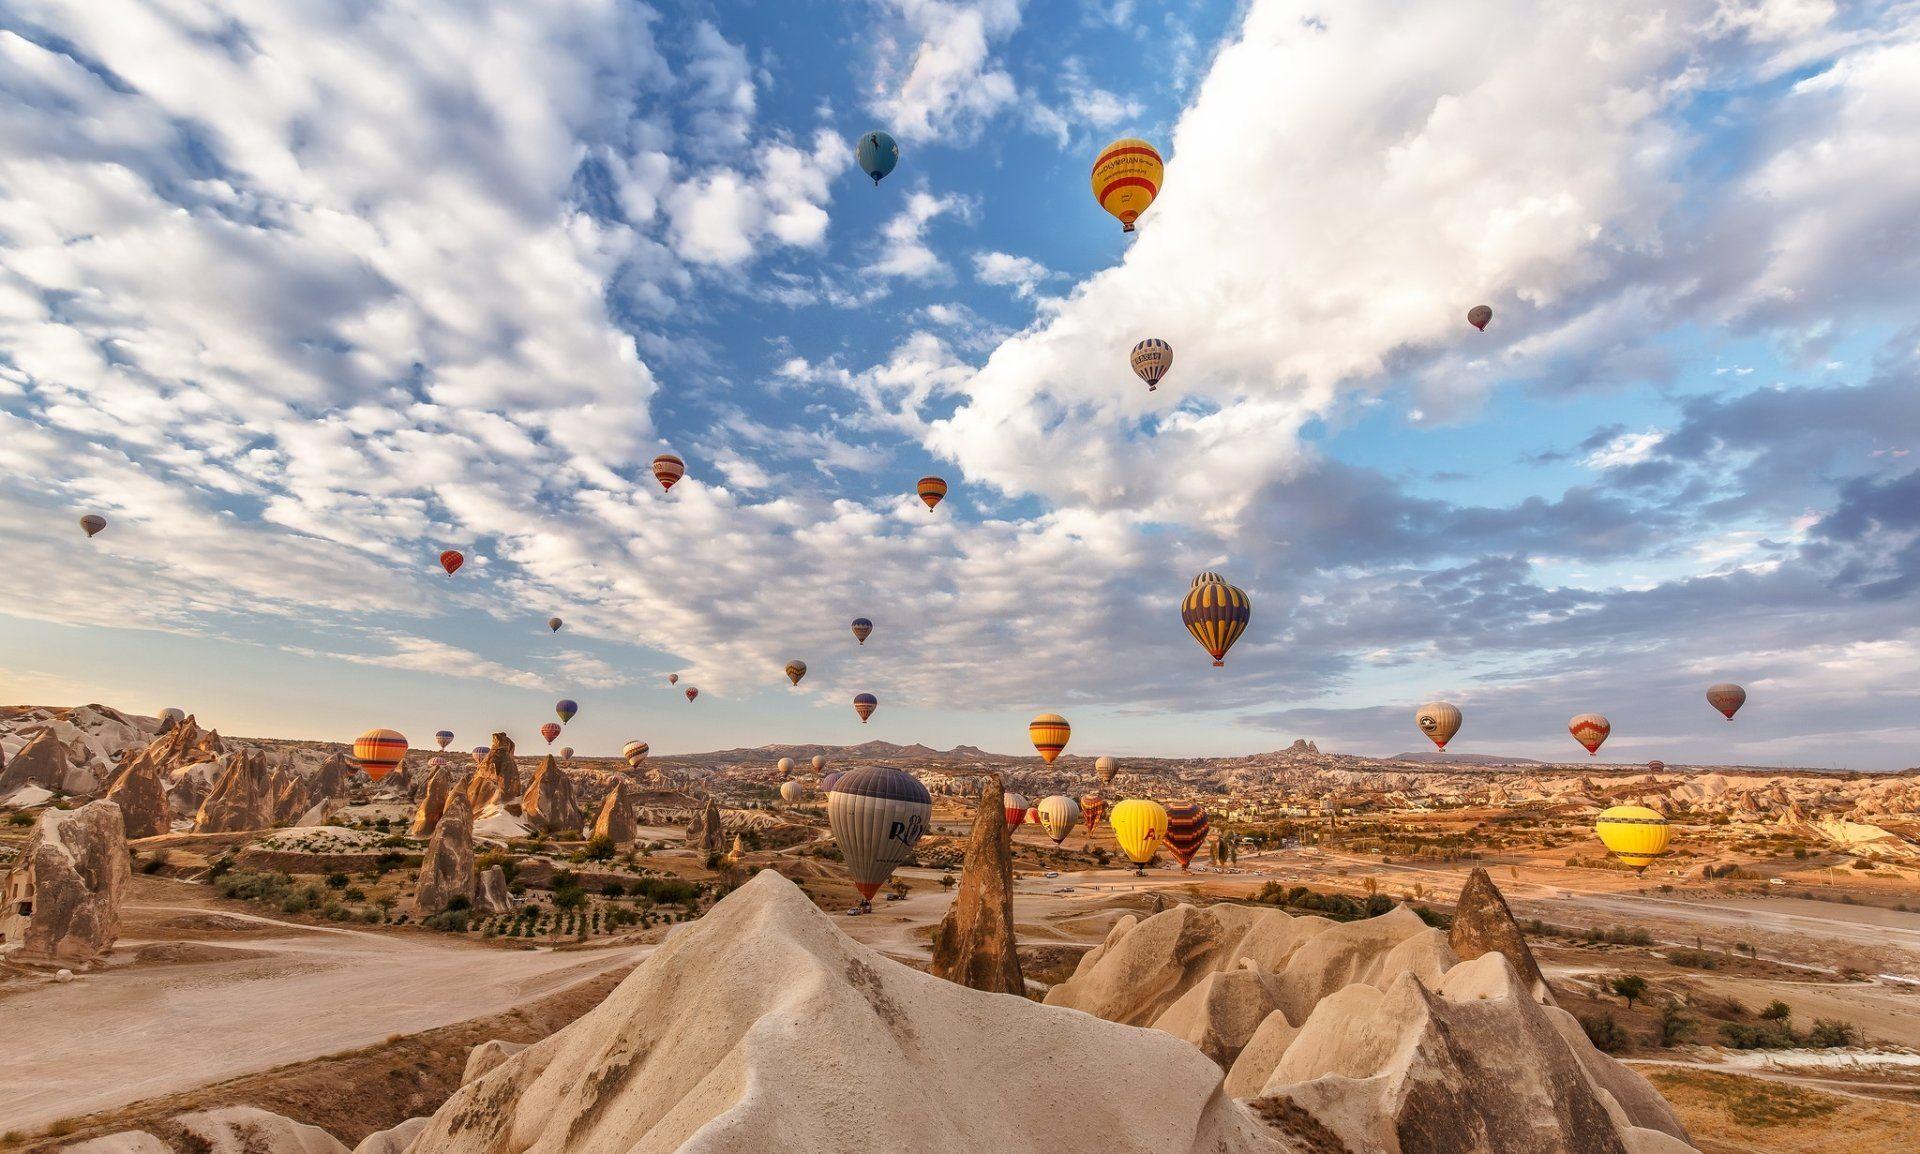 Vehicles Hot Air Balloon Landscape Desert Turkey Rock Sky